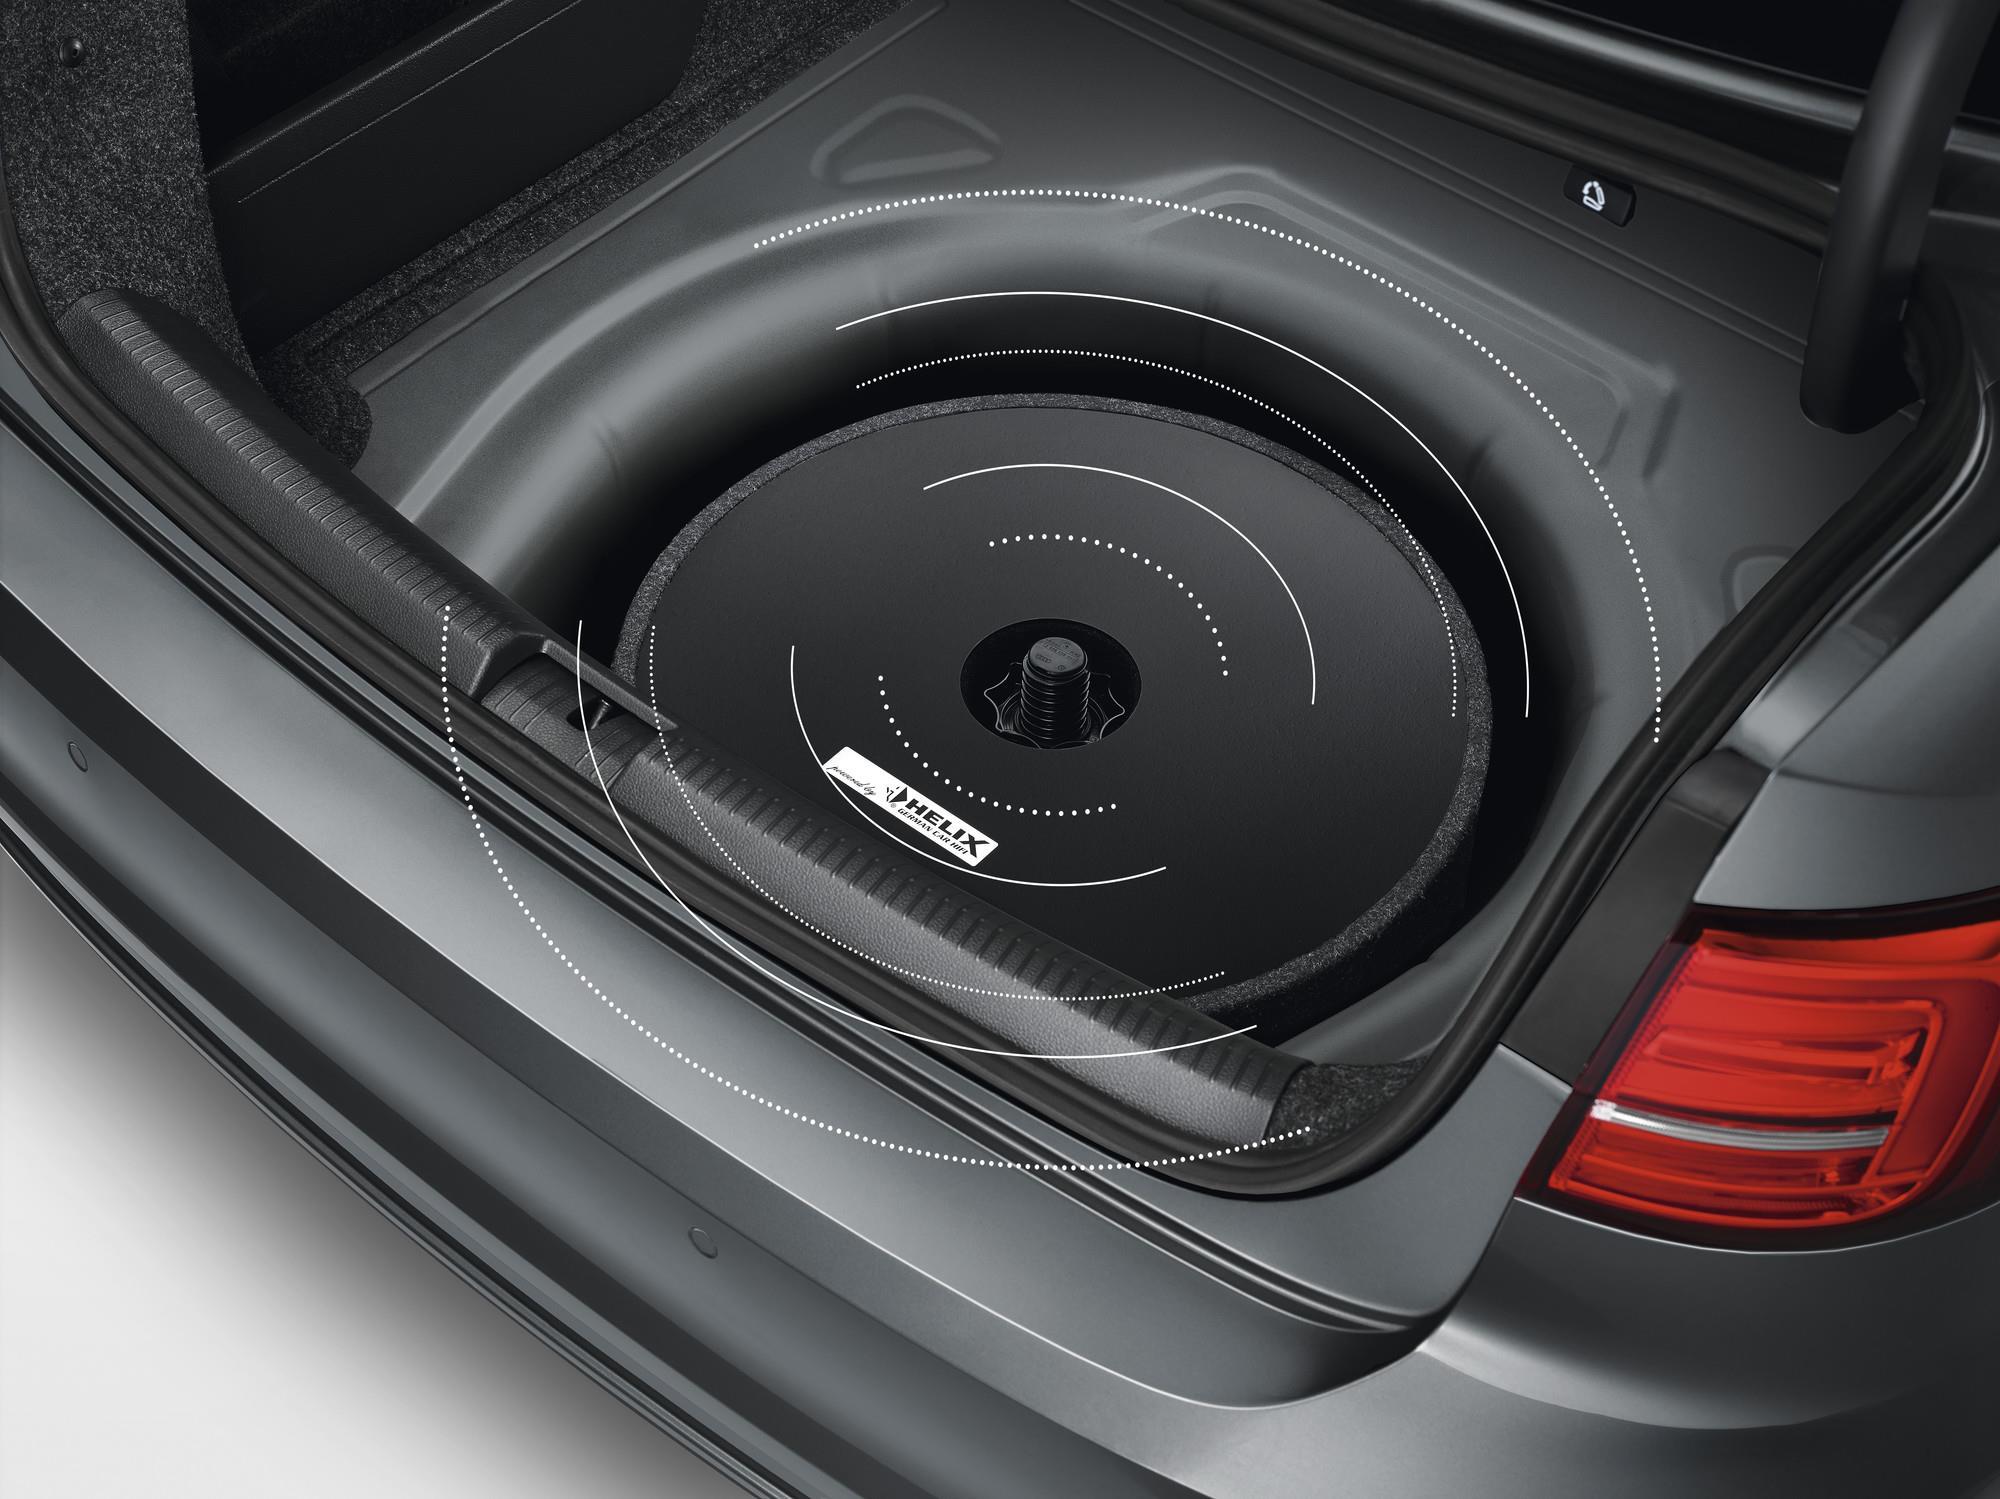 2017 Volkswagen Tiguan Spare Tire Mount Subwoofer / Soundbox. Communication, Models, DSP ...